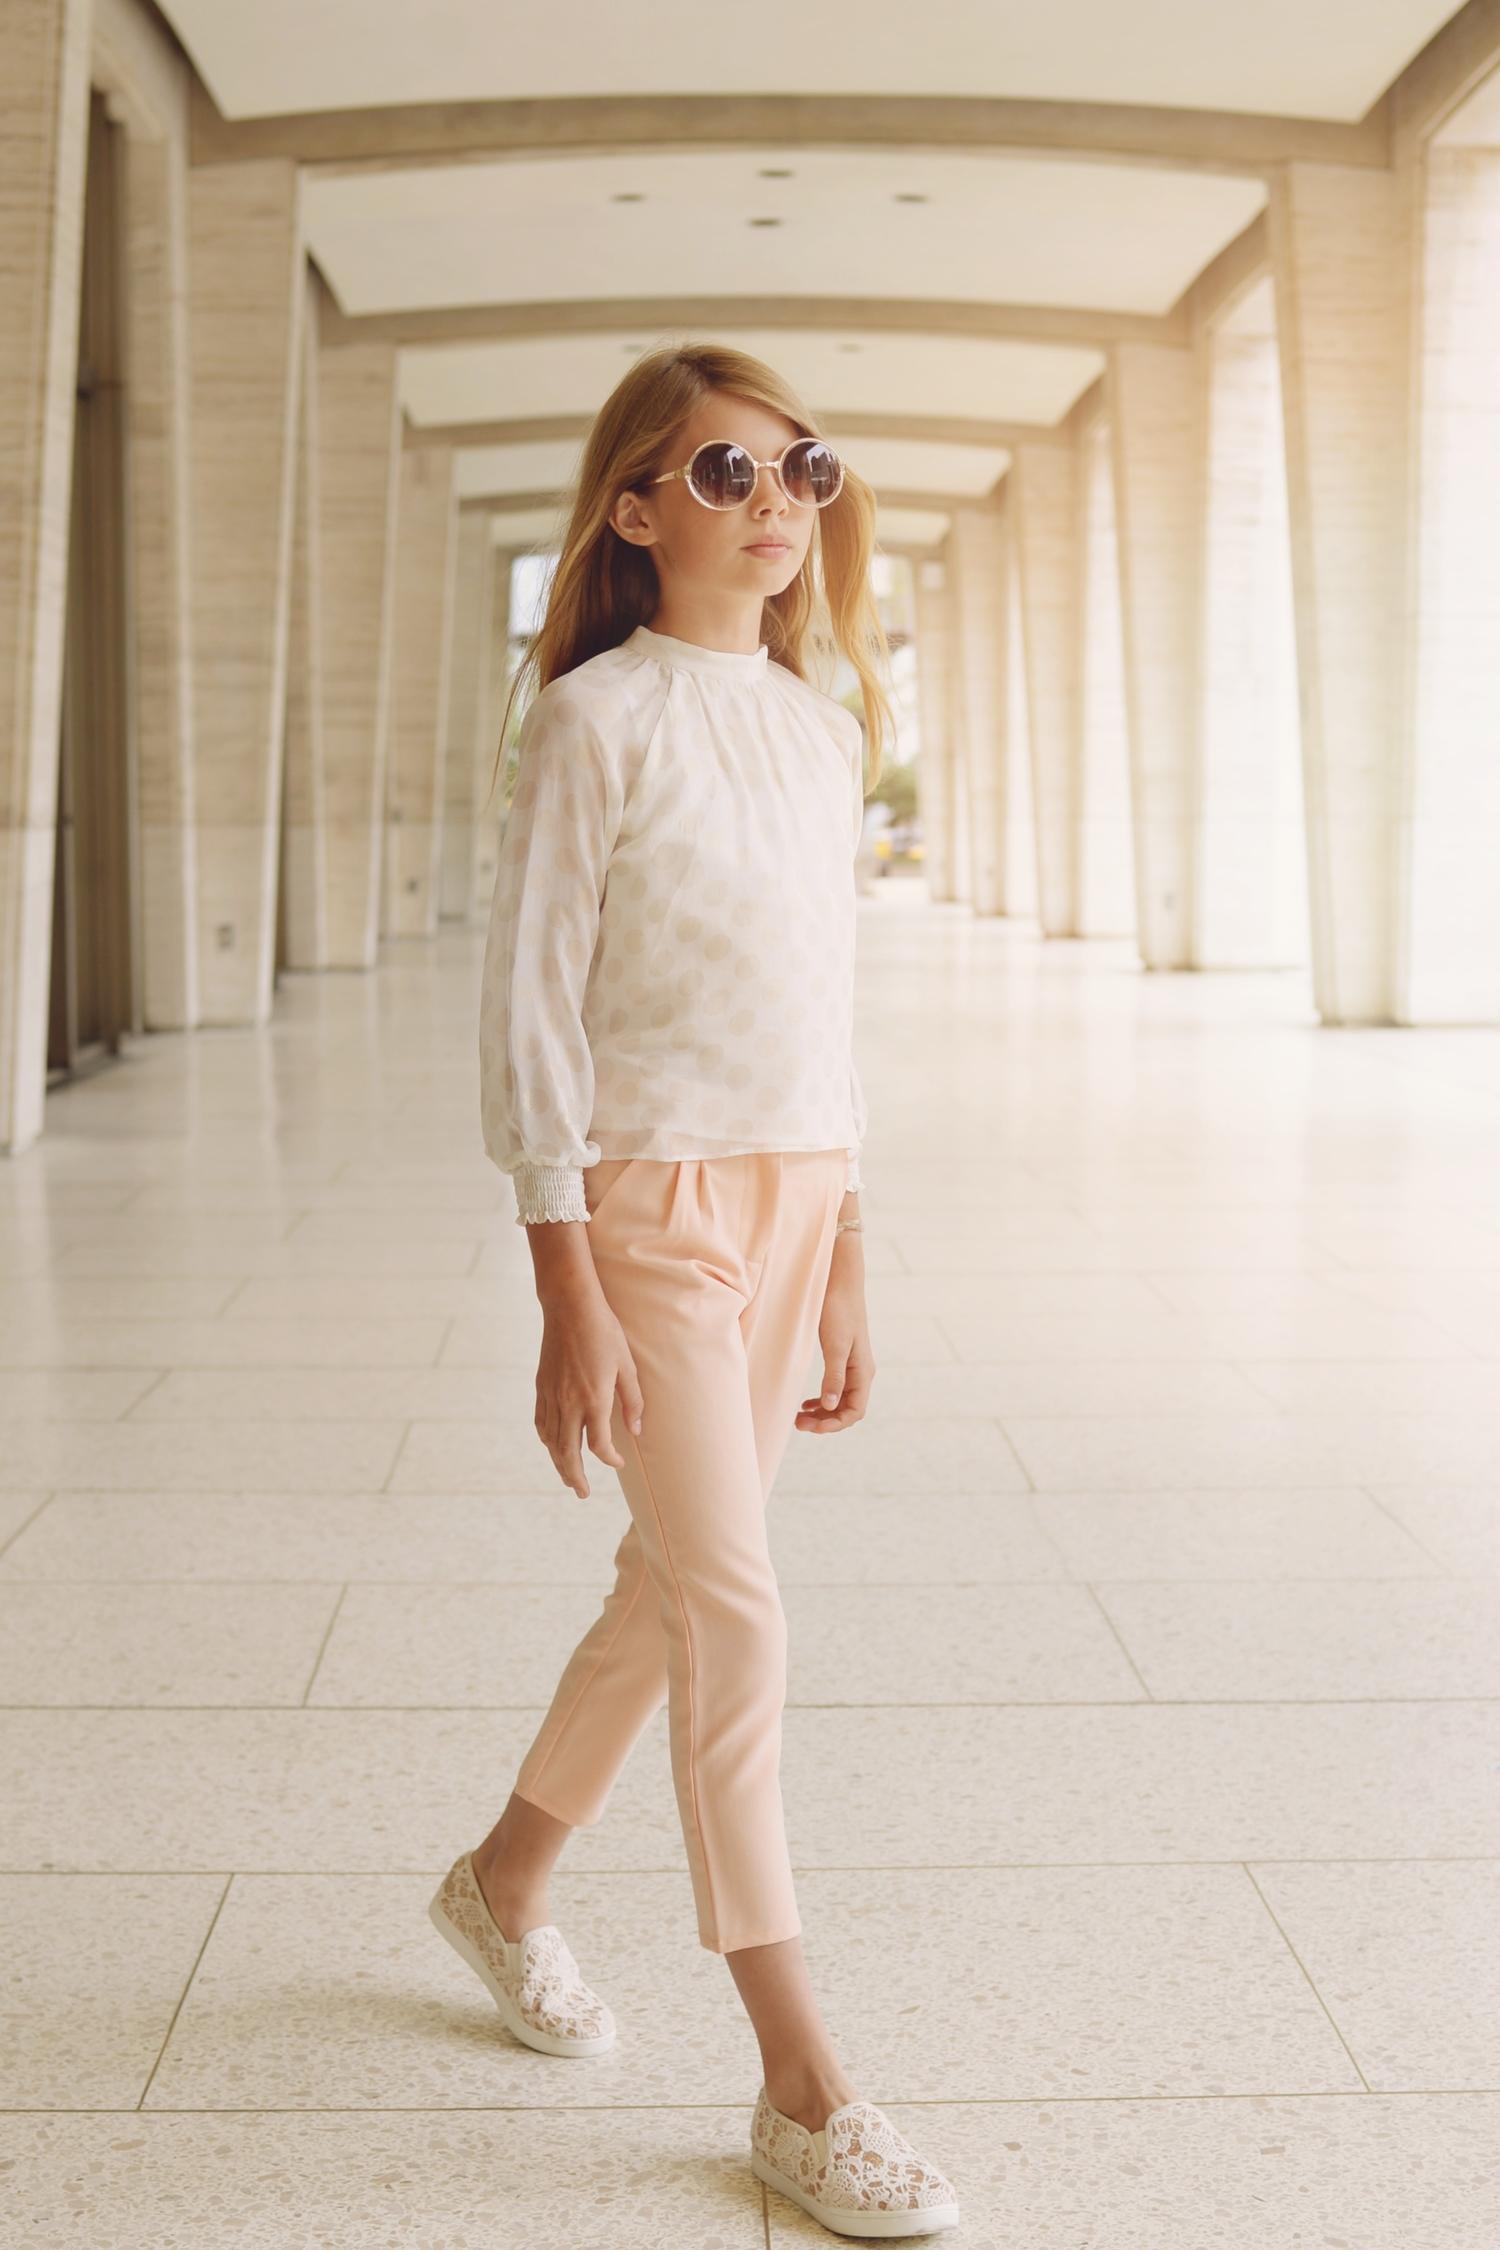 Enfant+Street+Style+by+Gina+Kim+Photography+Pale+Cloud-6.jpeg